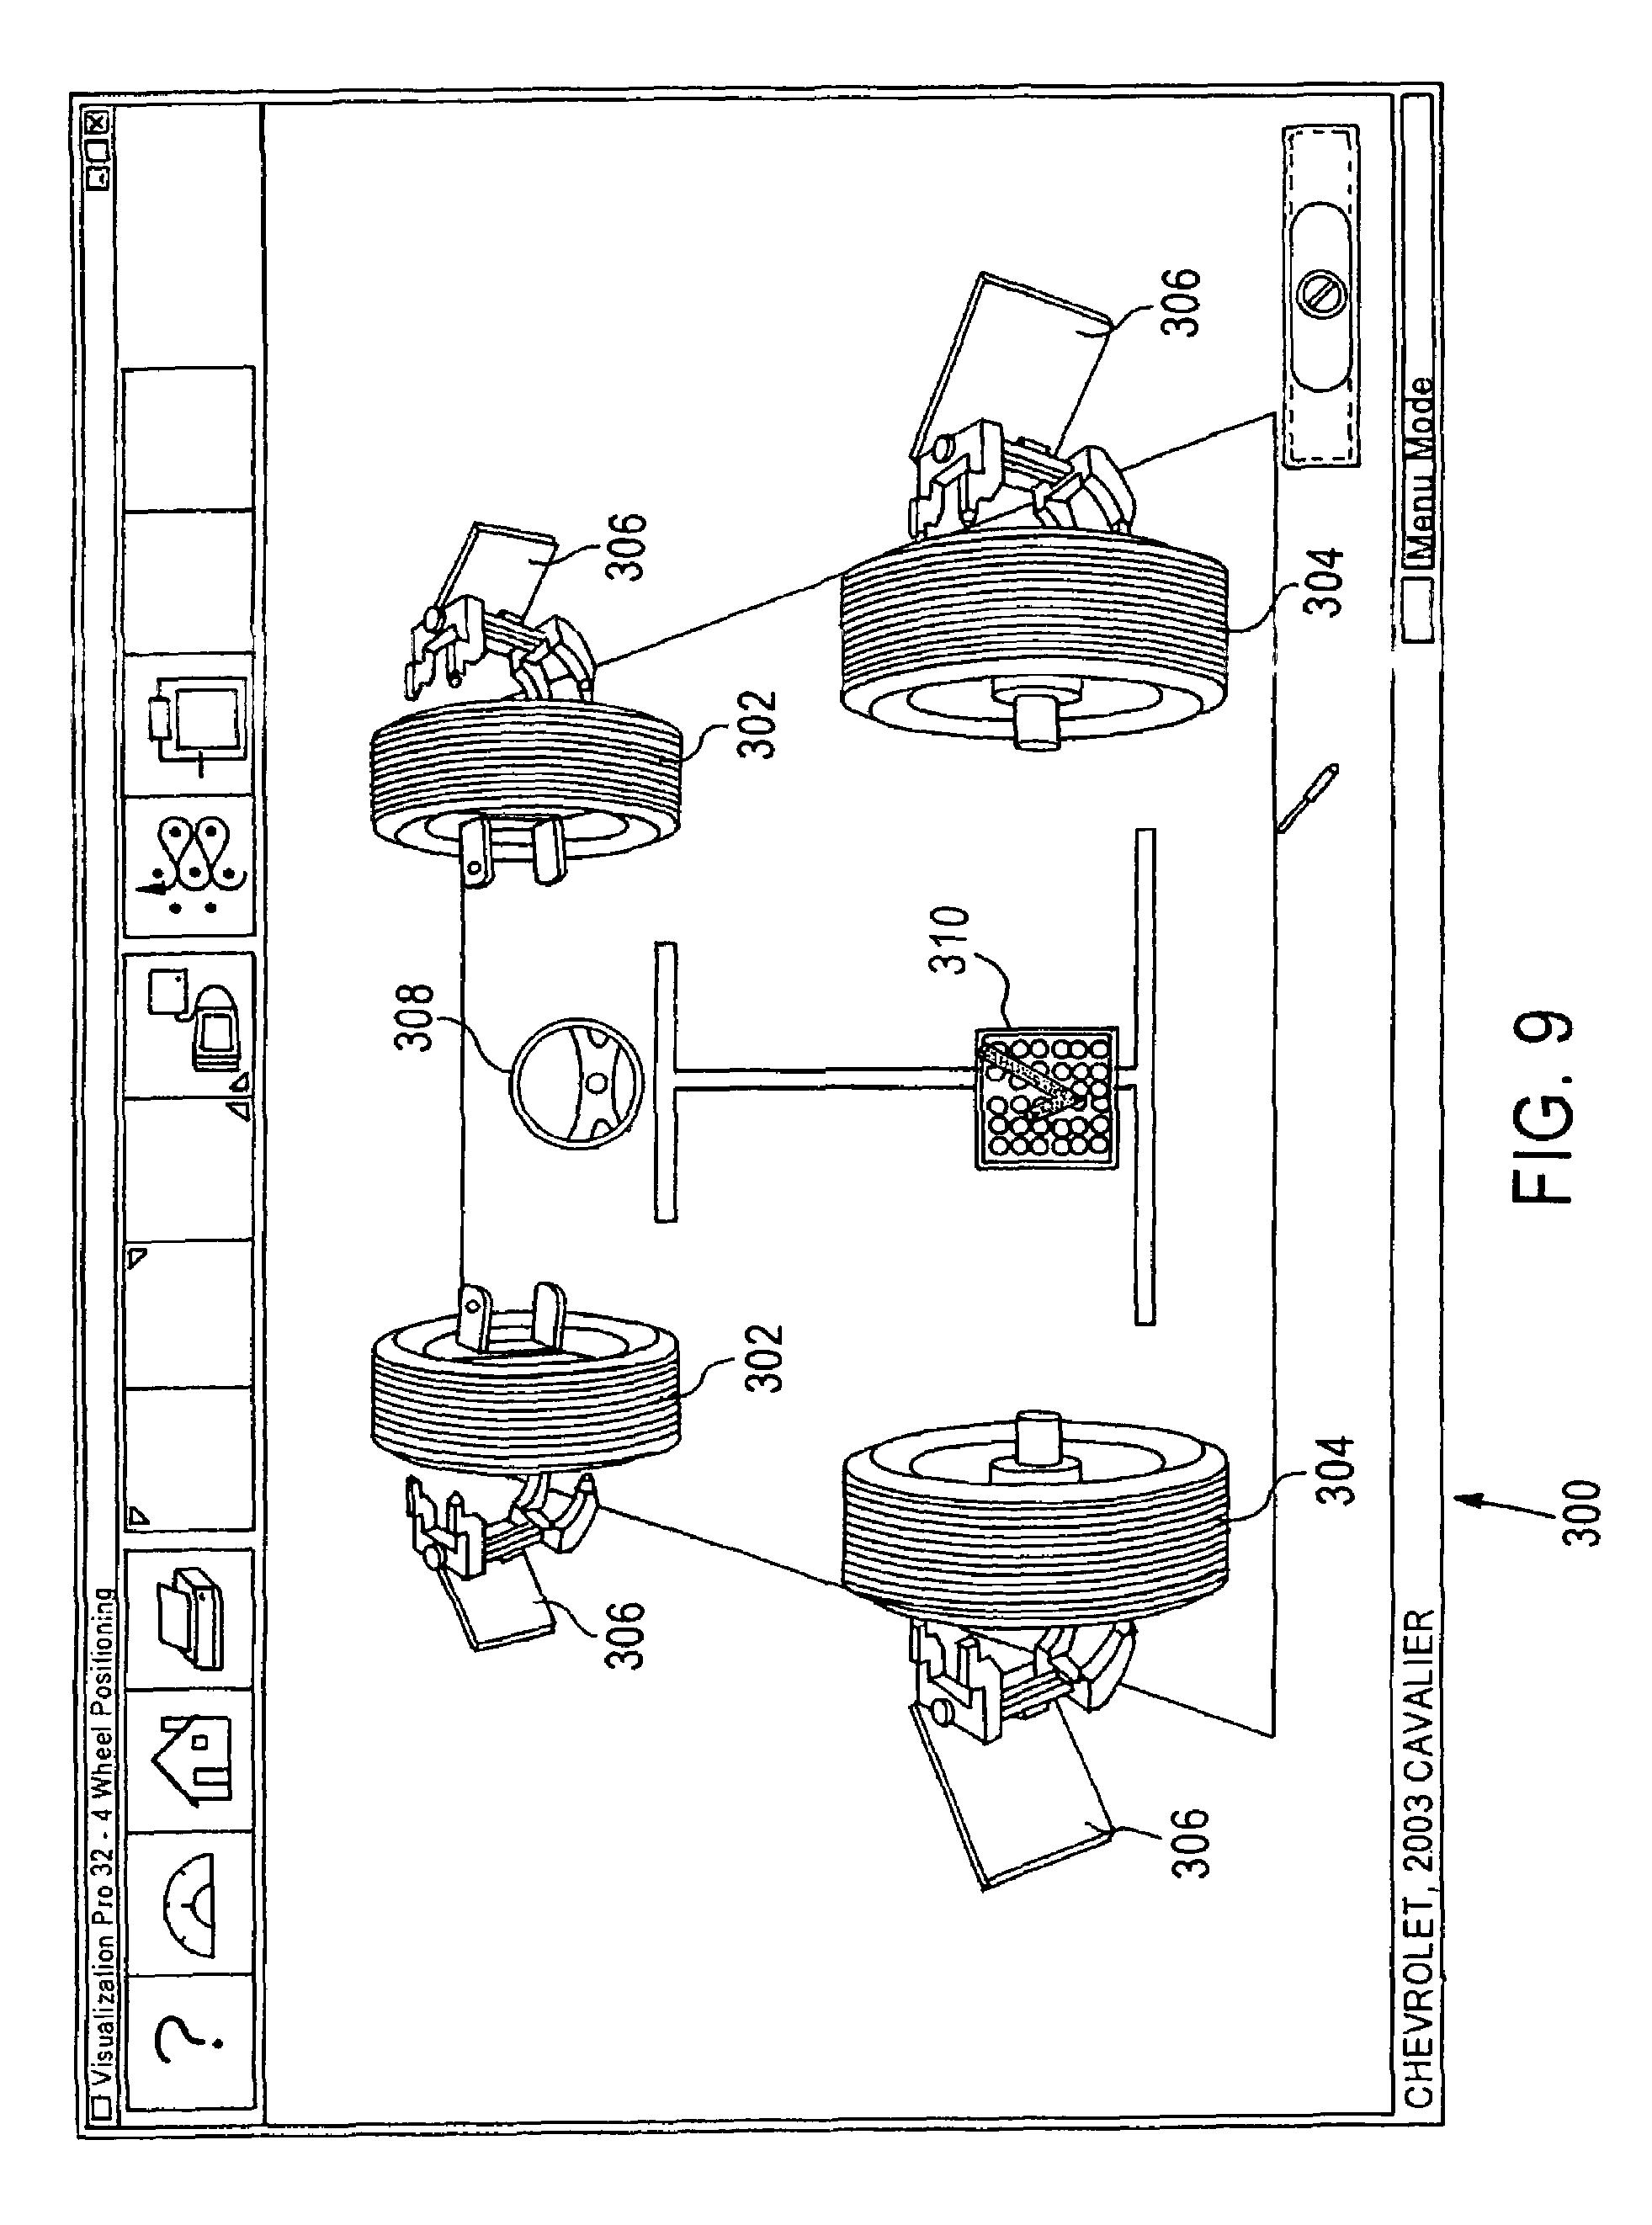 hunter dsp wiring diagram bmw e39 dsp wiring diagram